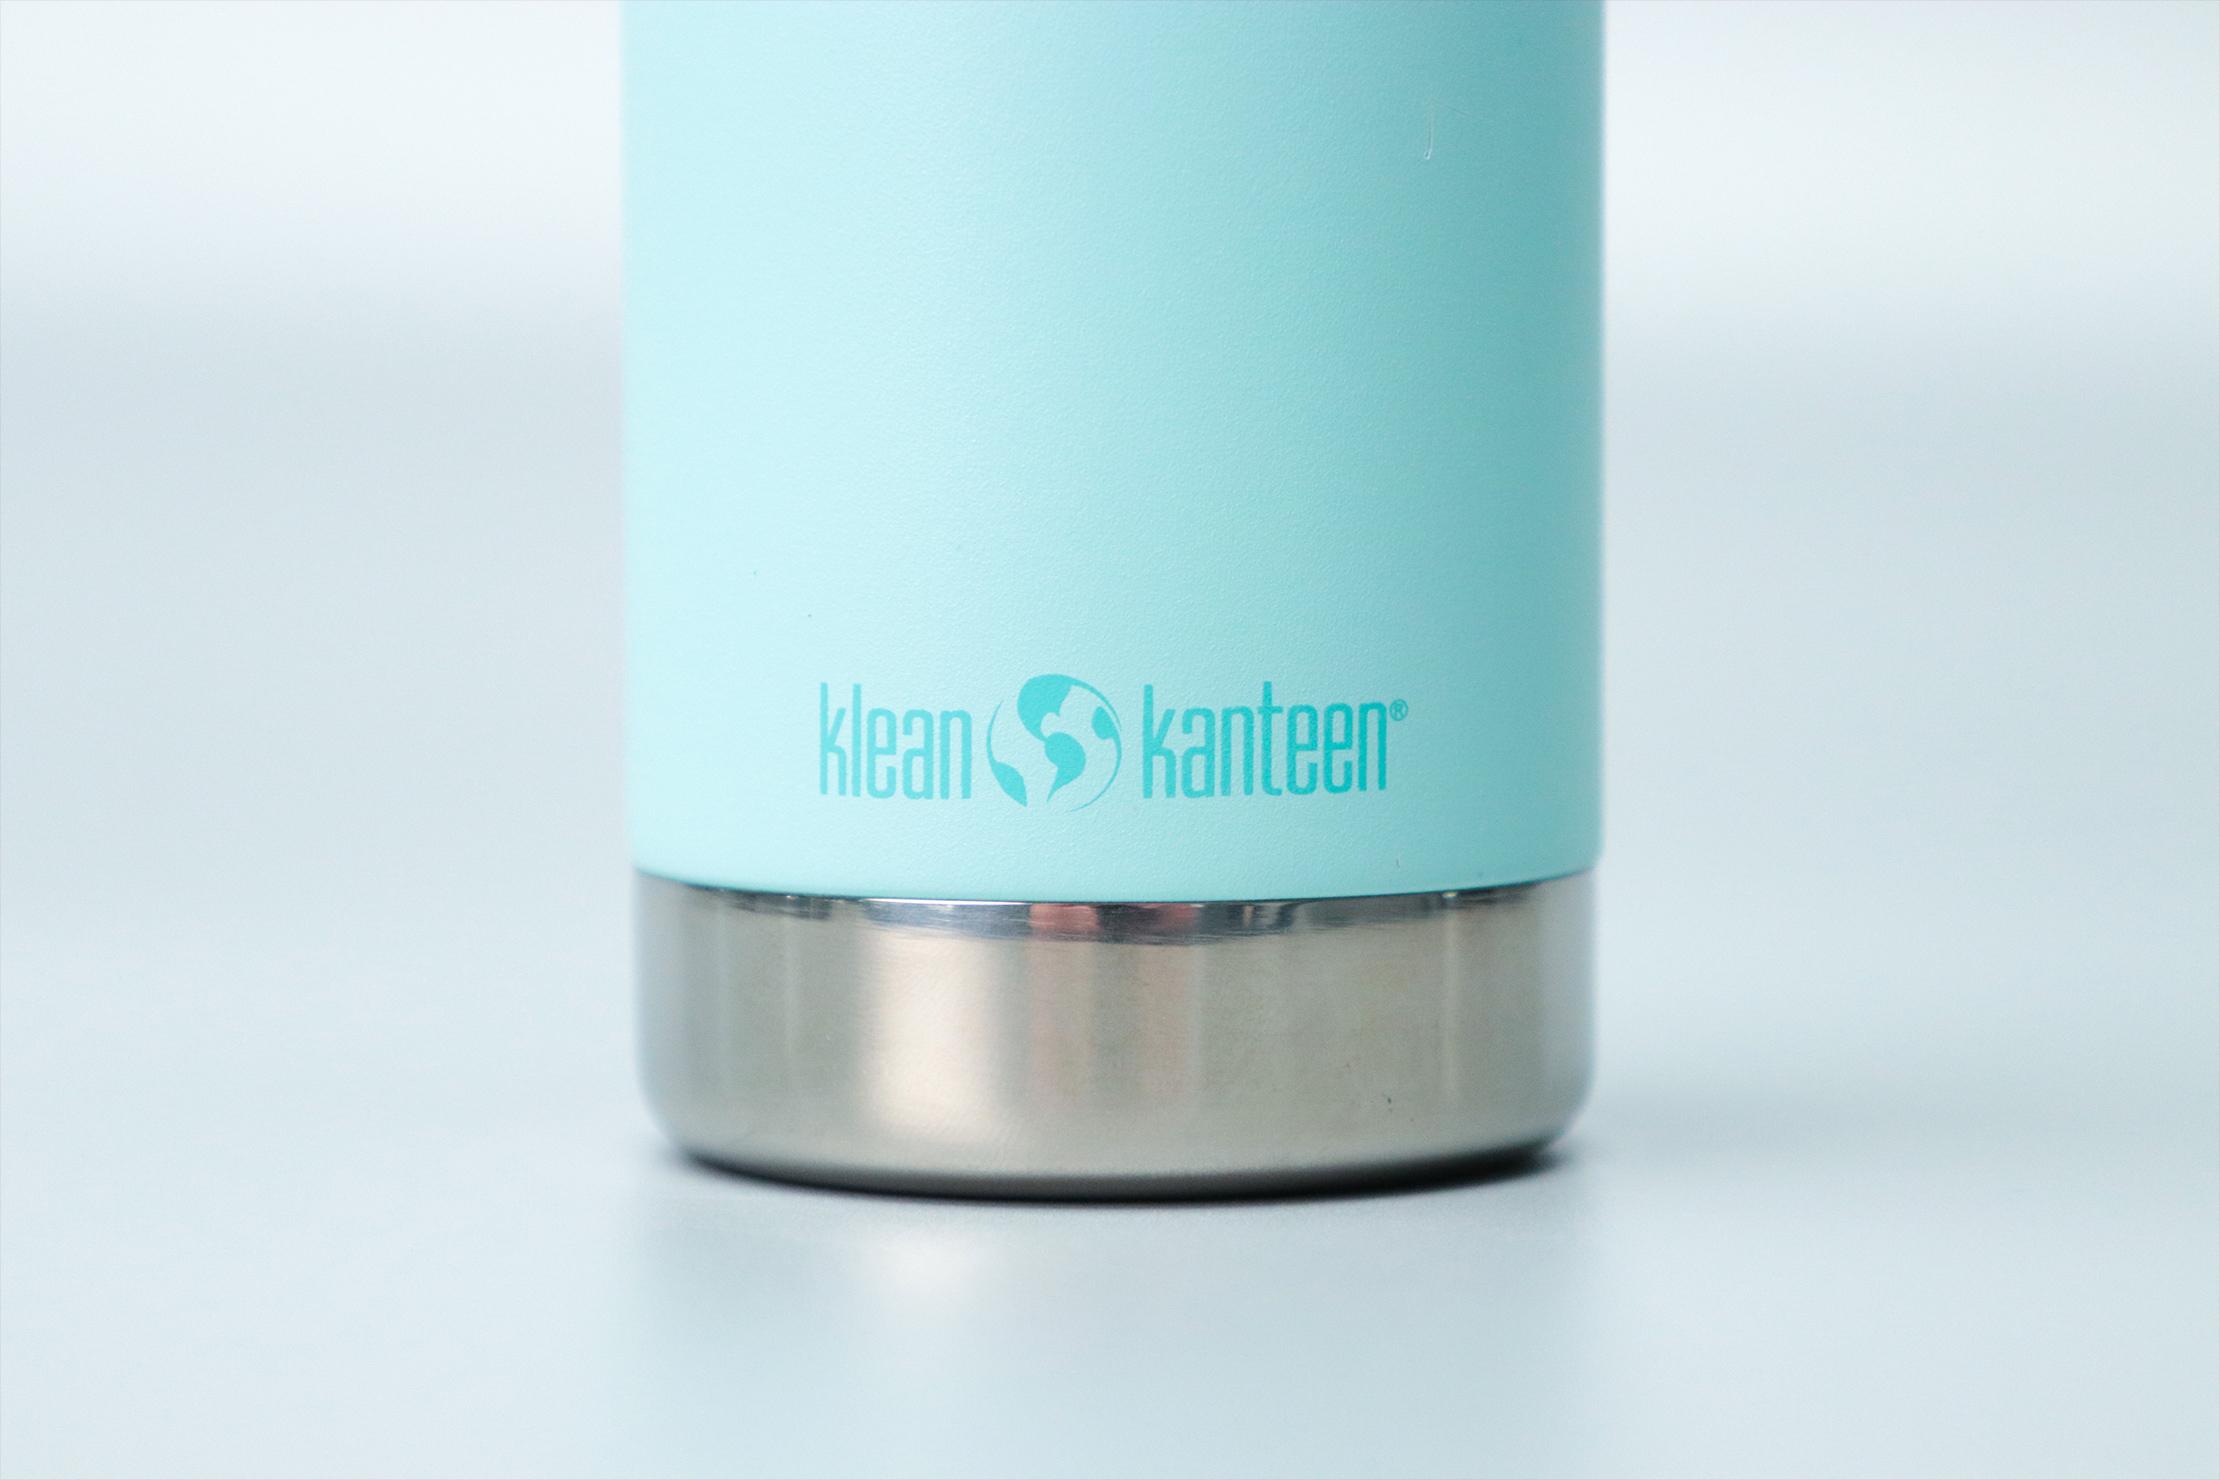 Klean Kanteen Insulated TKWide 16 oz Logo